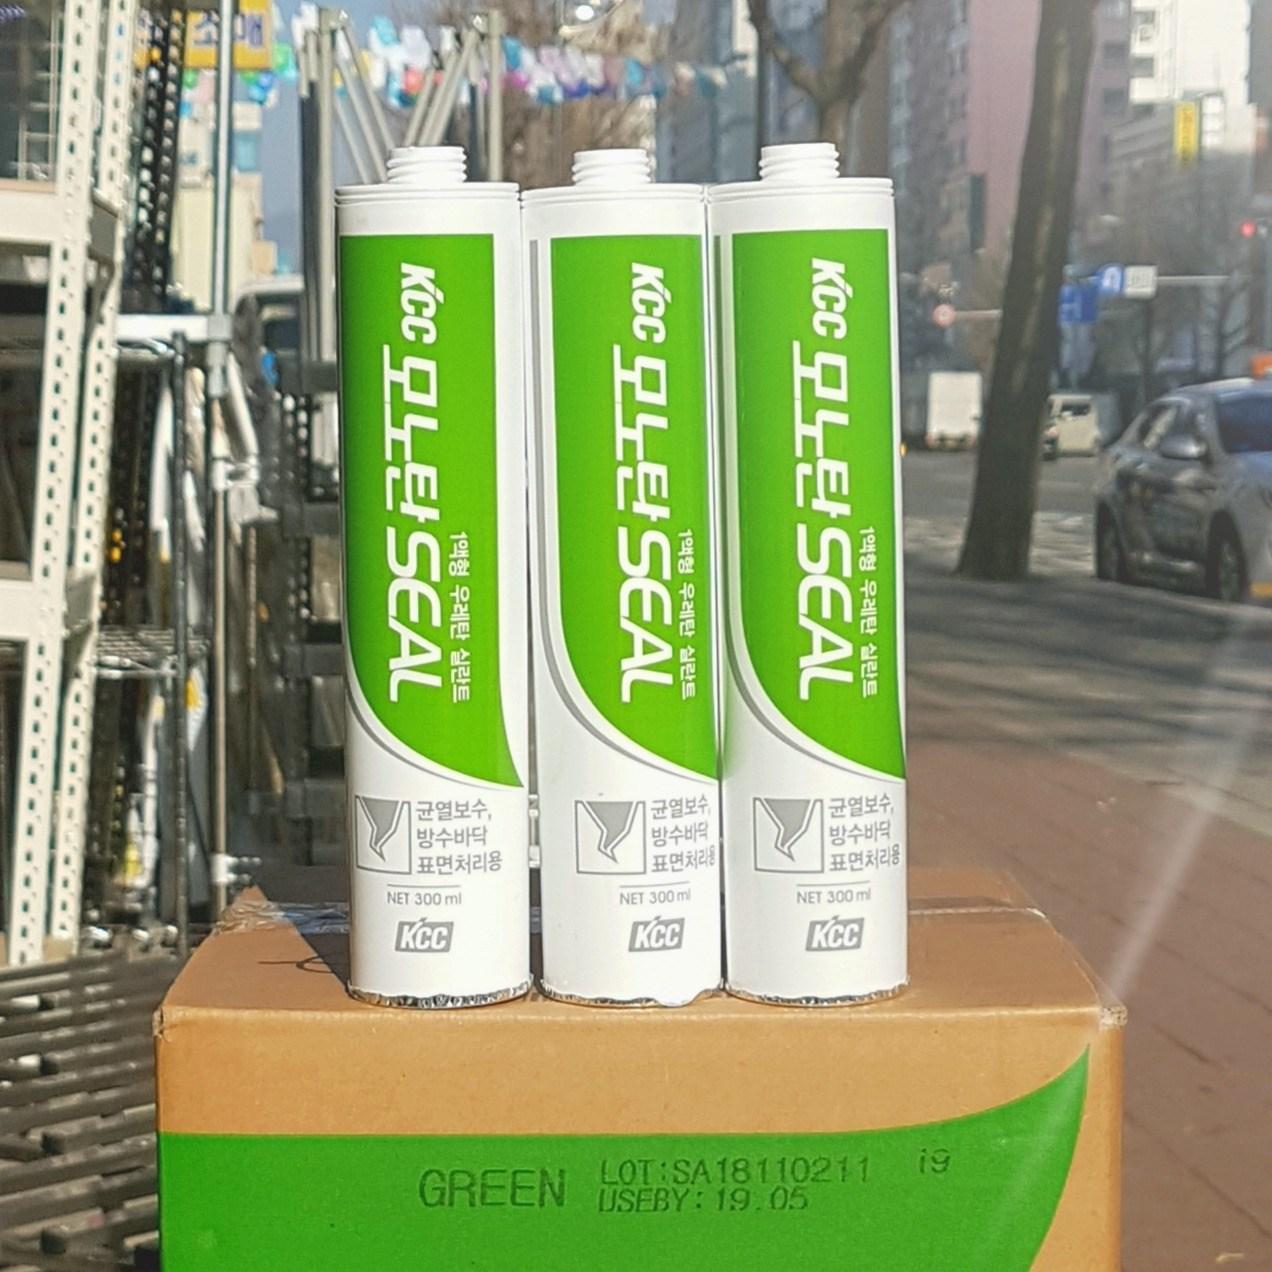 KCC 우레탄 실리콘 모노탄씰 녹색 300ml 옥상방수용